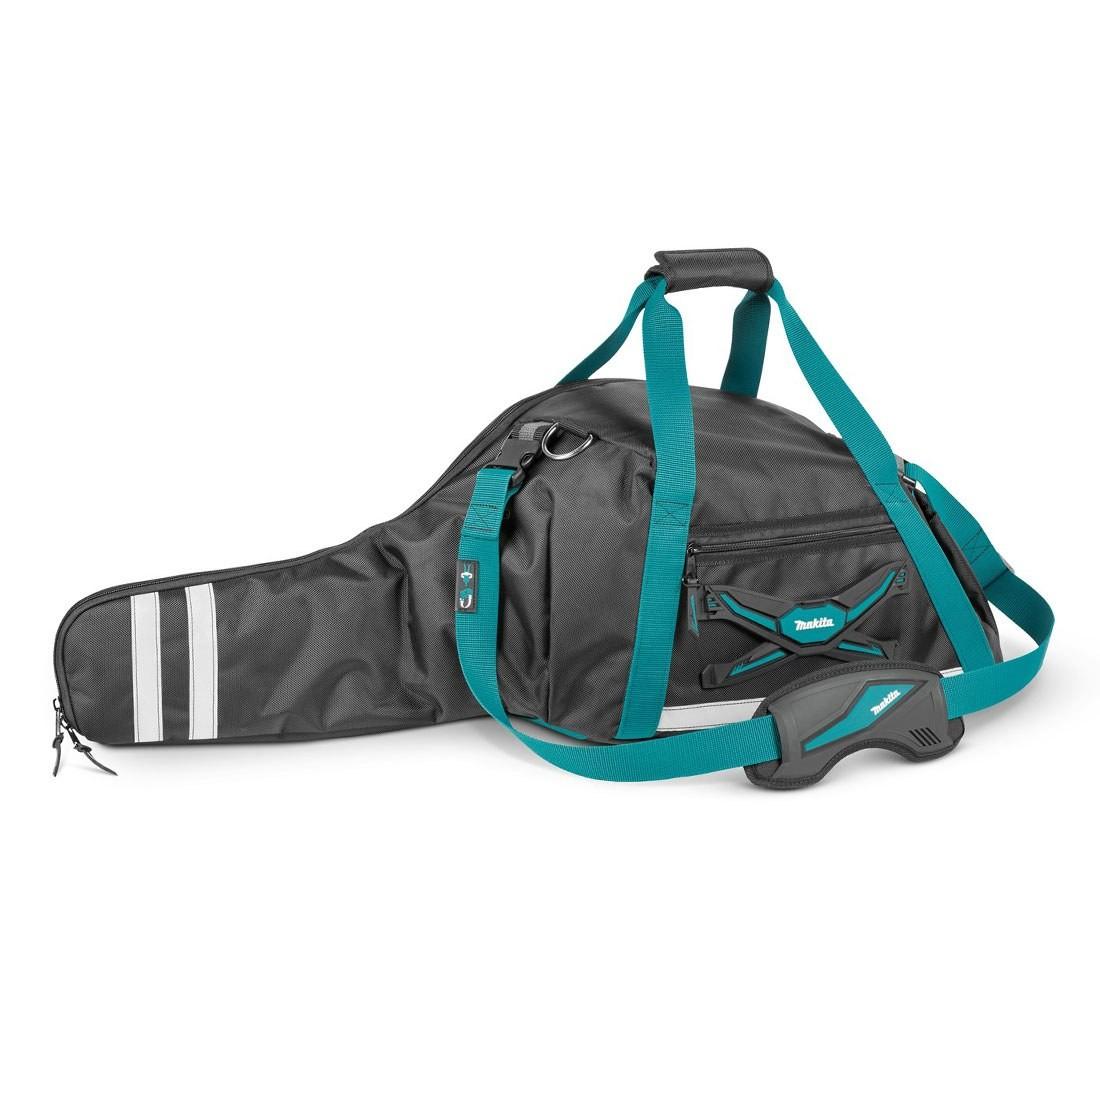 Makita TH3 Chainsaw Carry Bag - E-05549